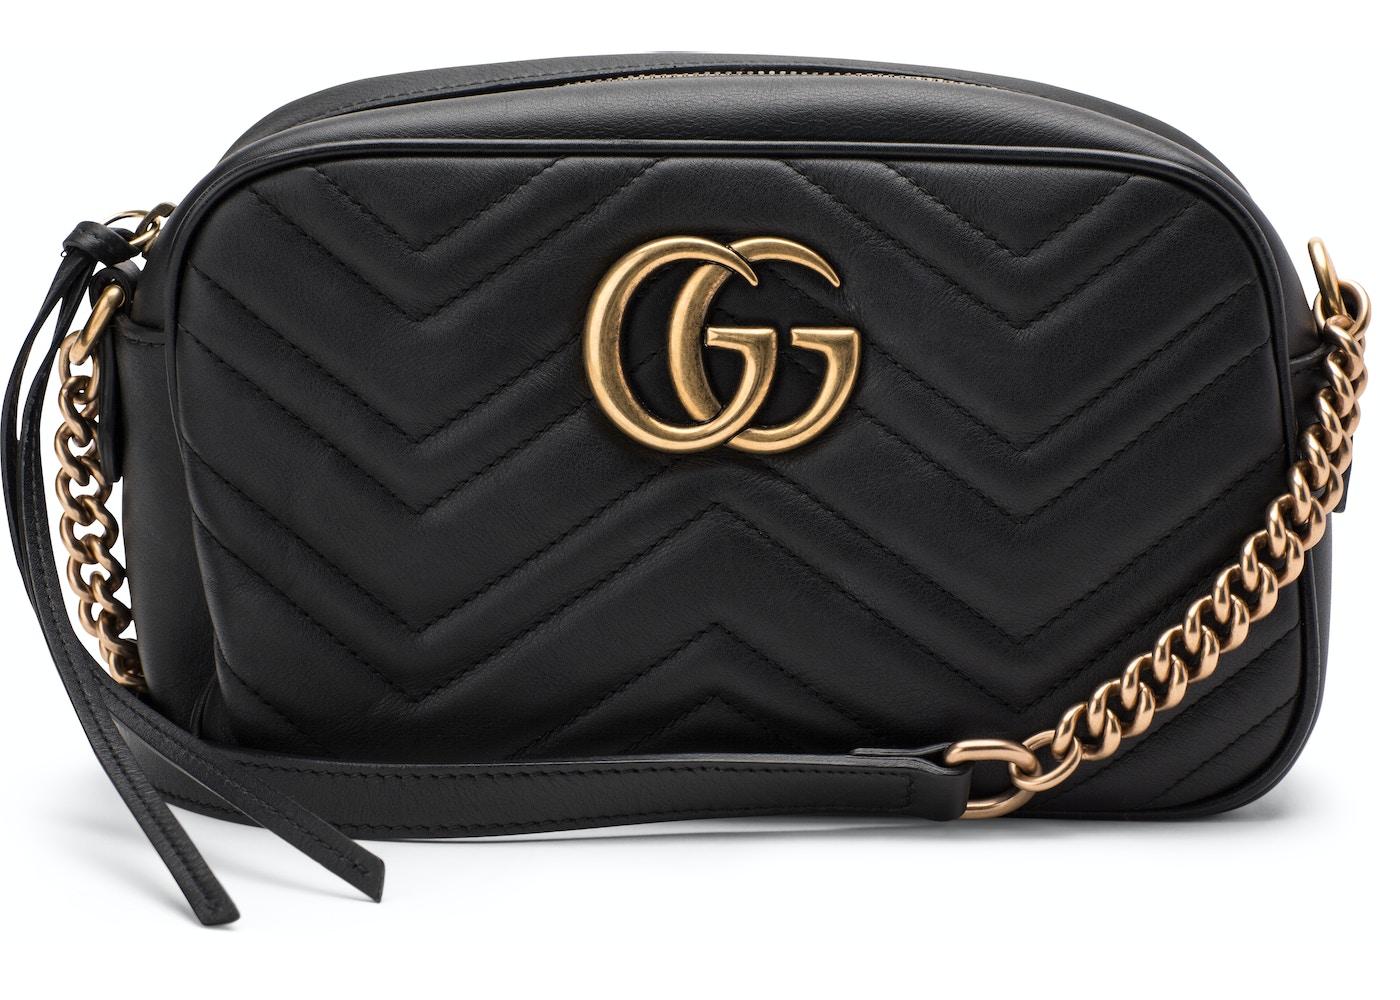 93ededc75 Buy & Sell Gucci Luxury Handbags